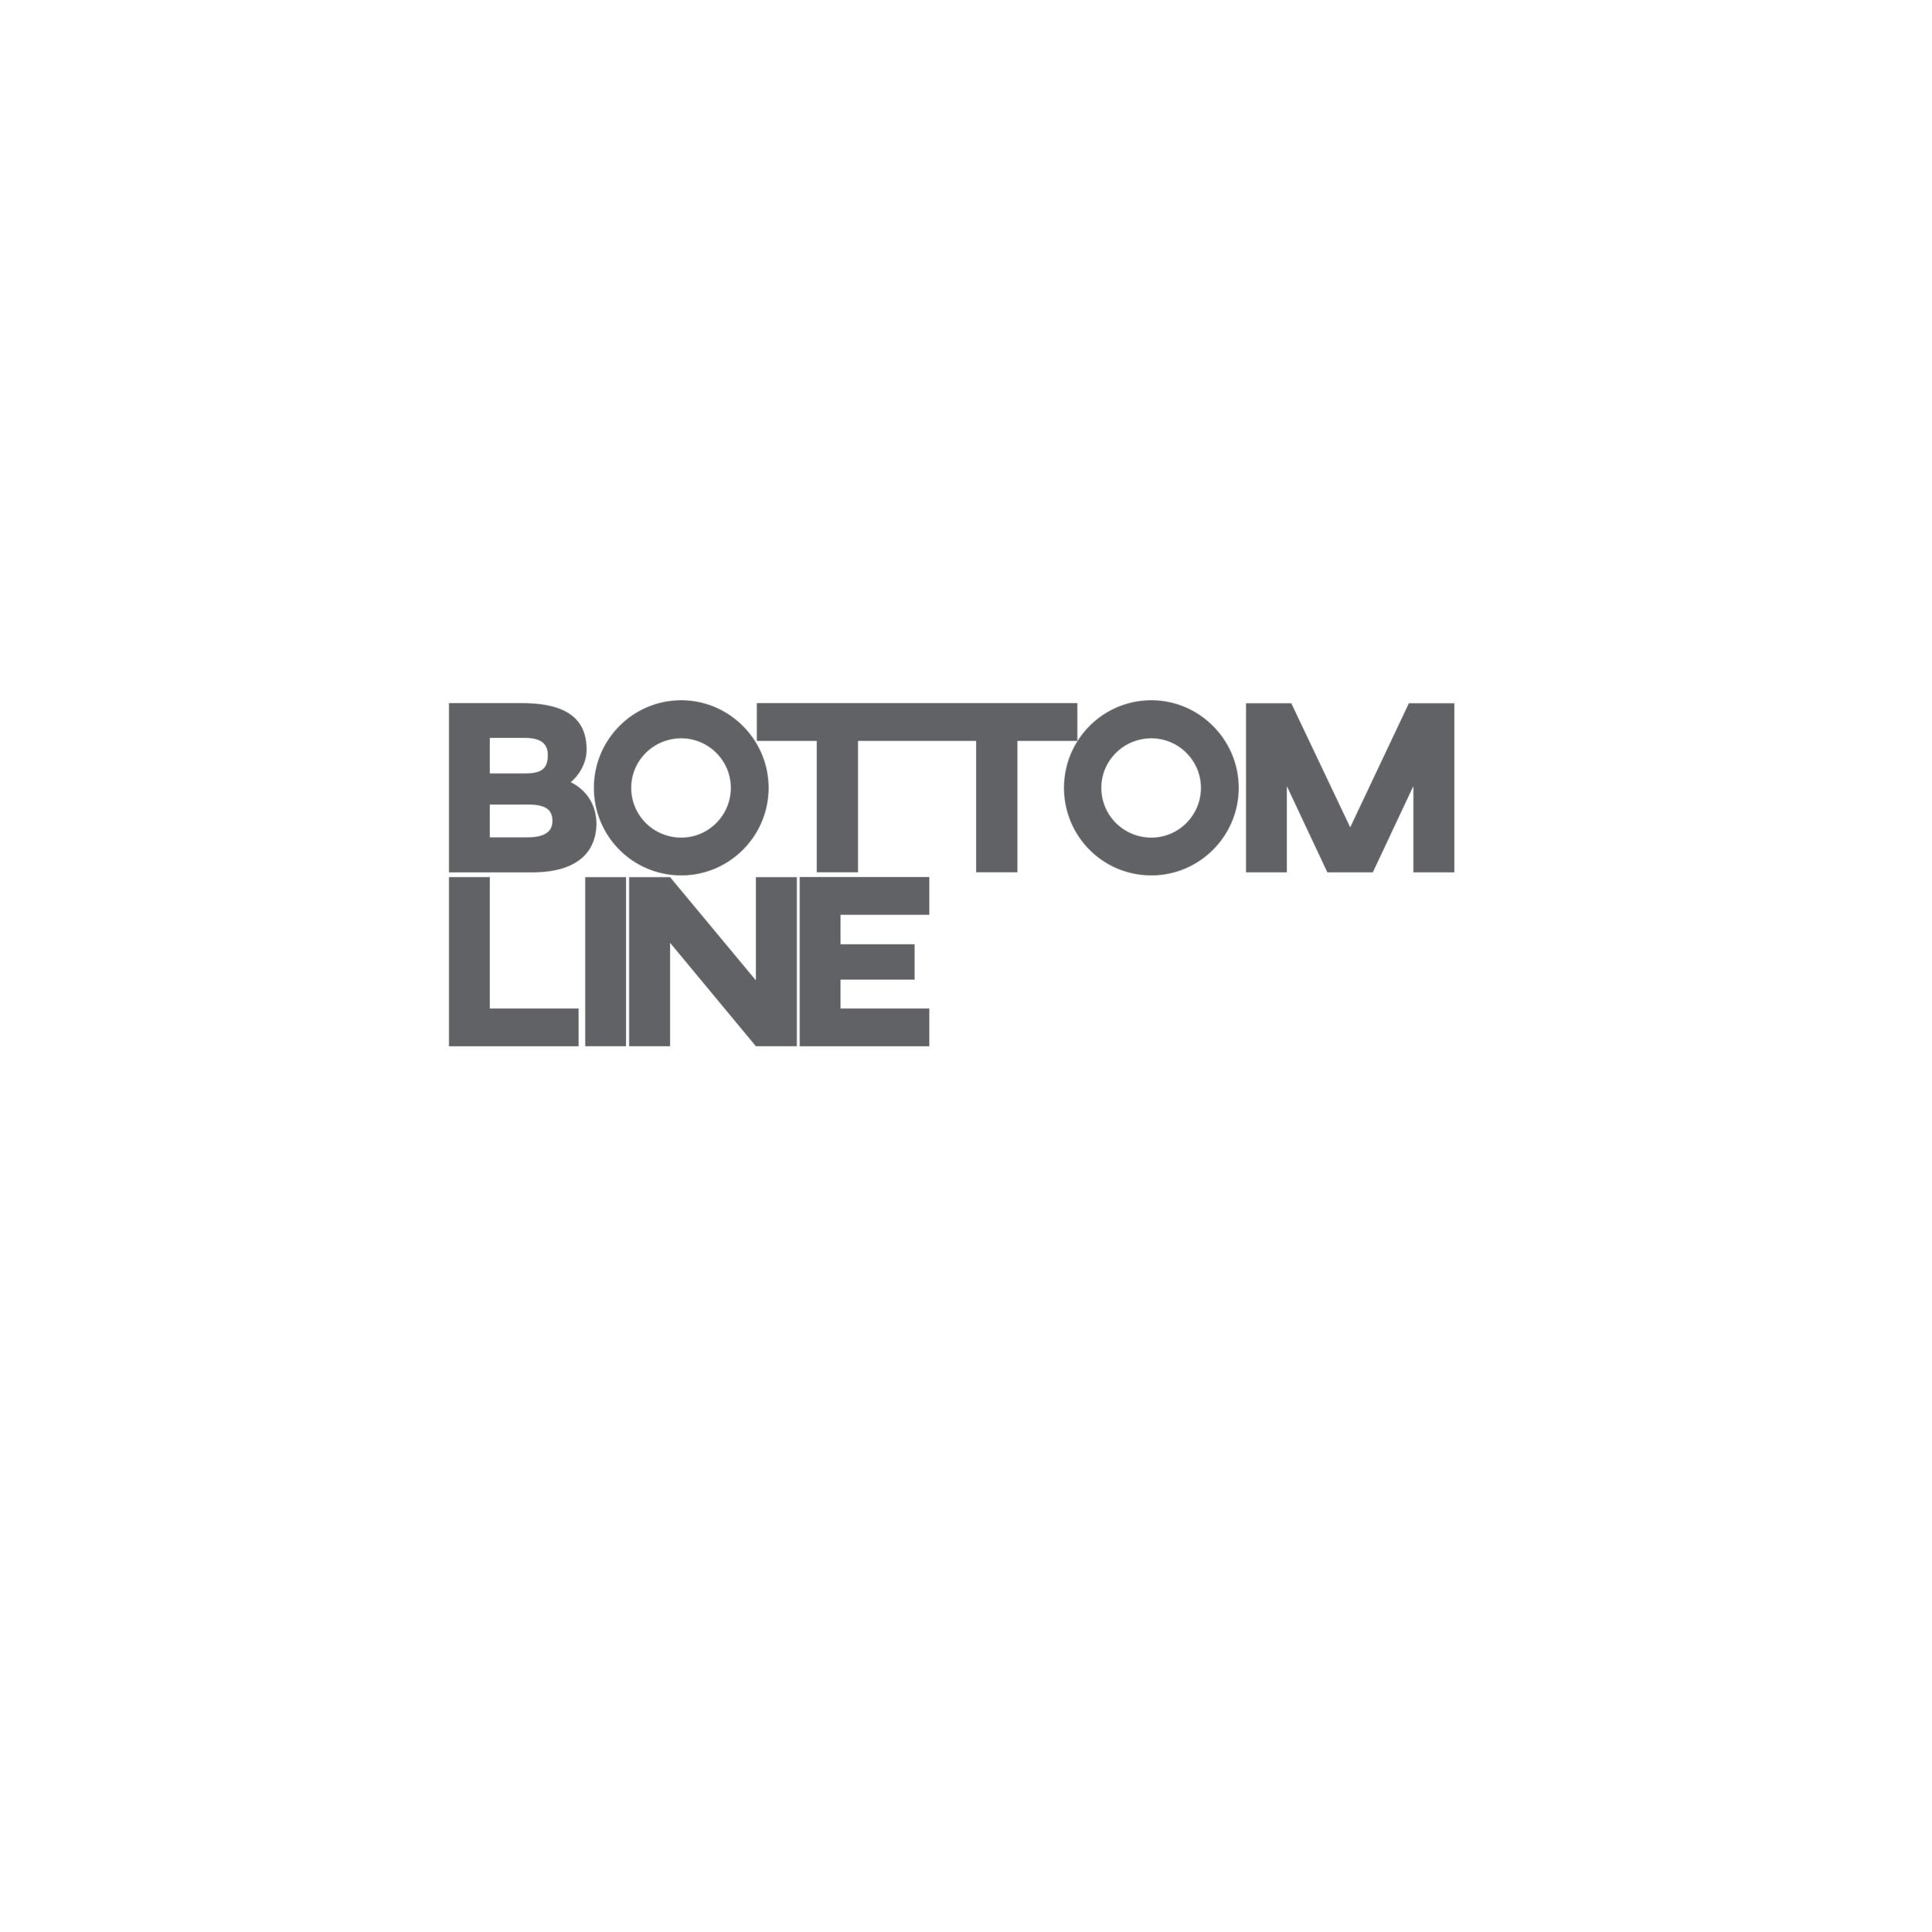 bottomline.png